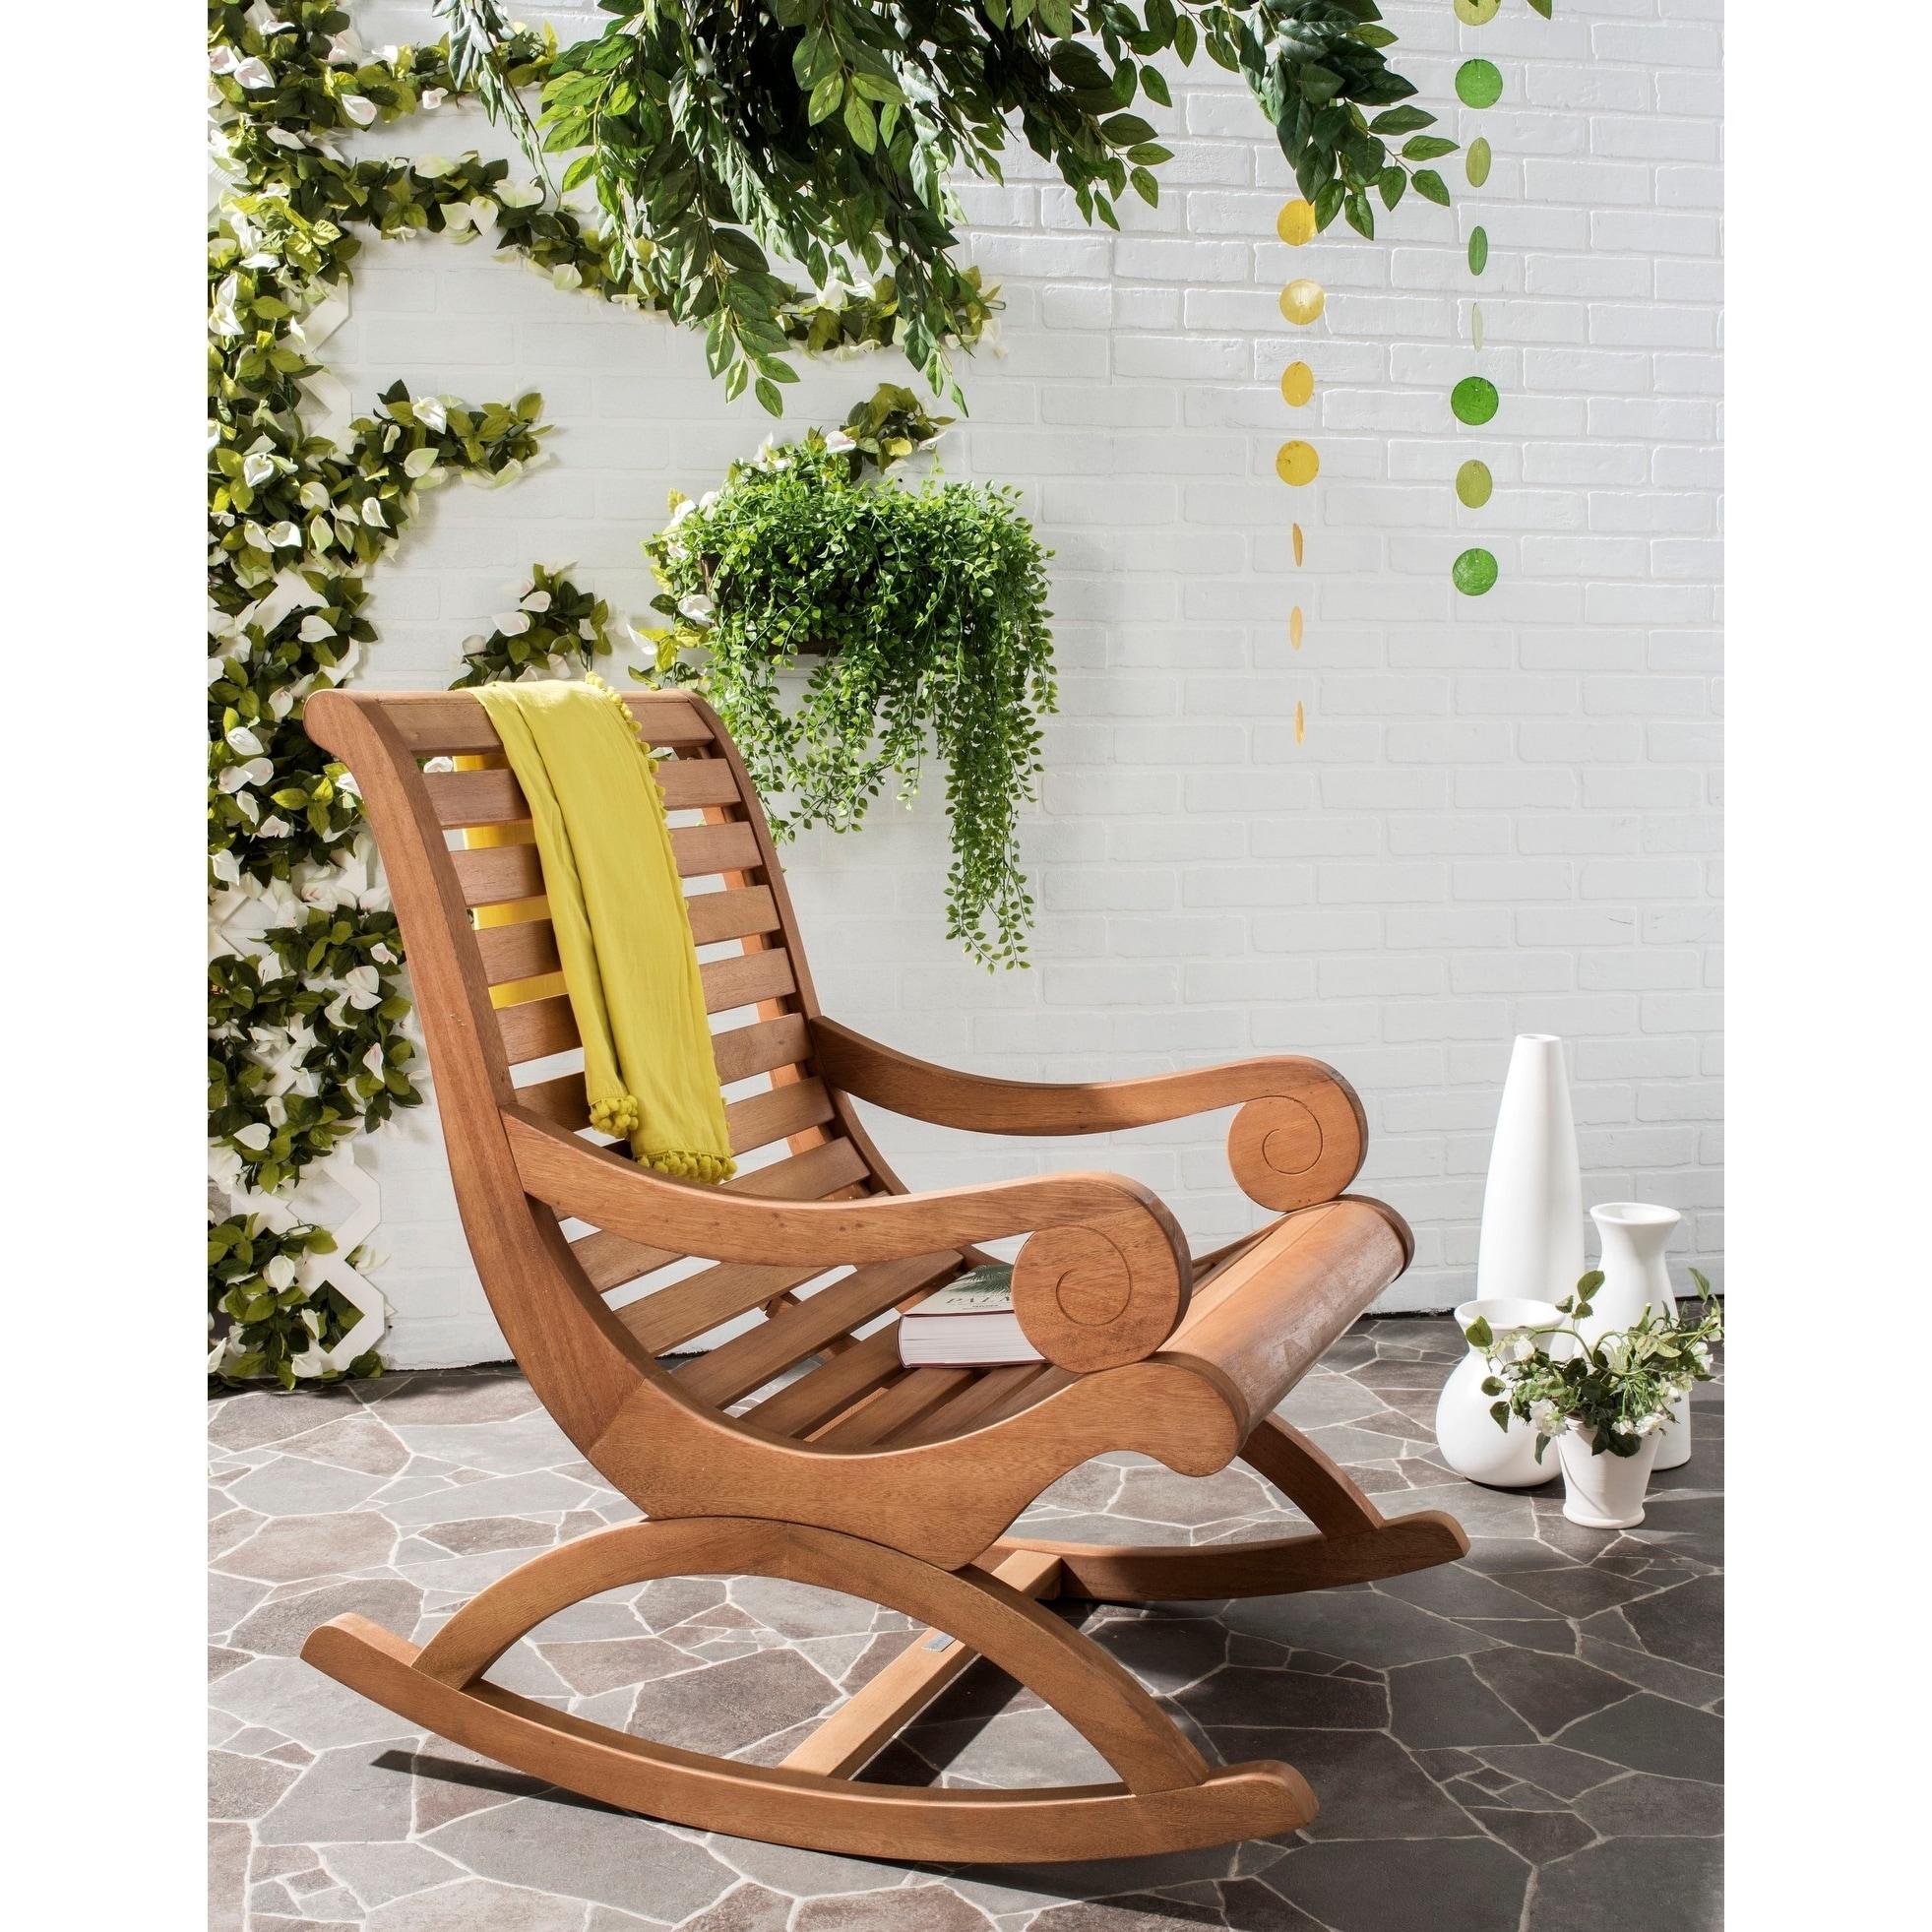 Safavieh Outdoor Living Sonora Teak Brown Rocking Chair (.